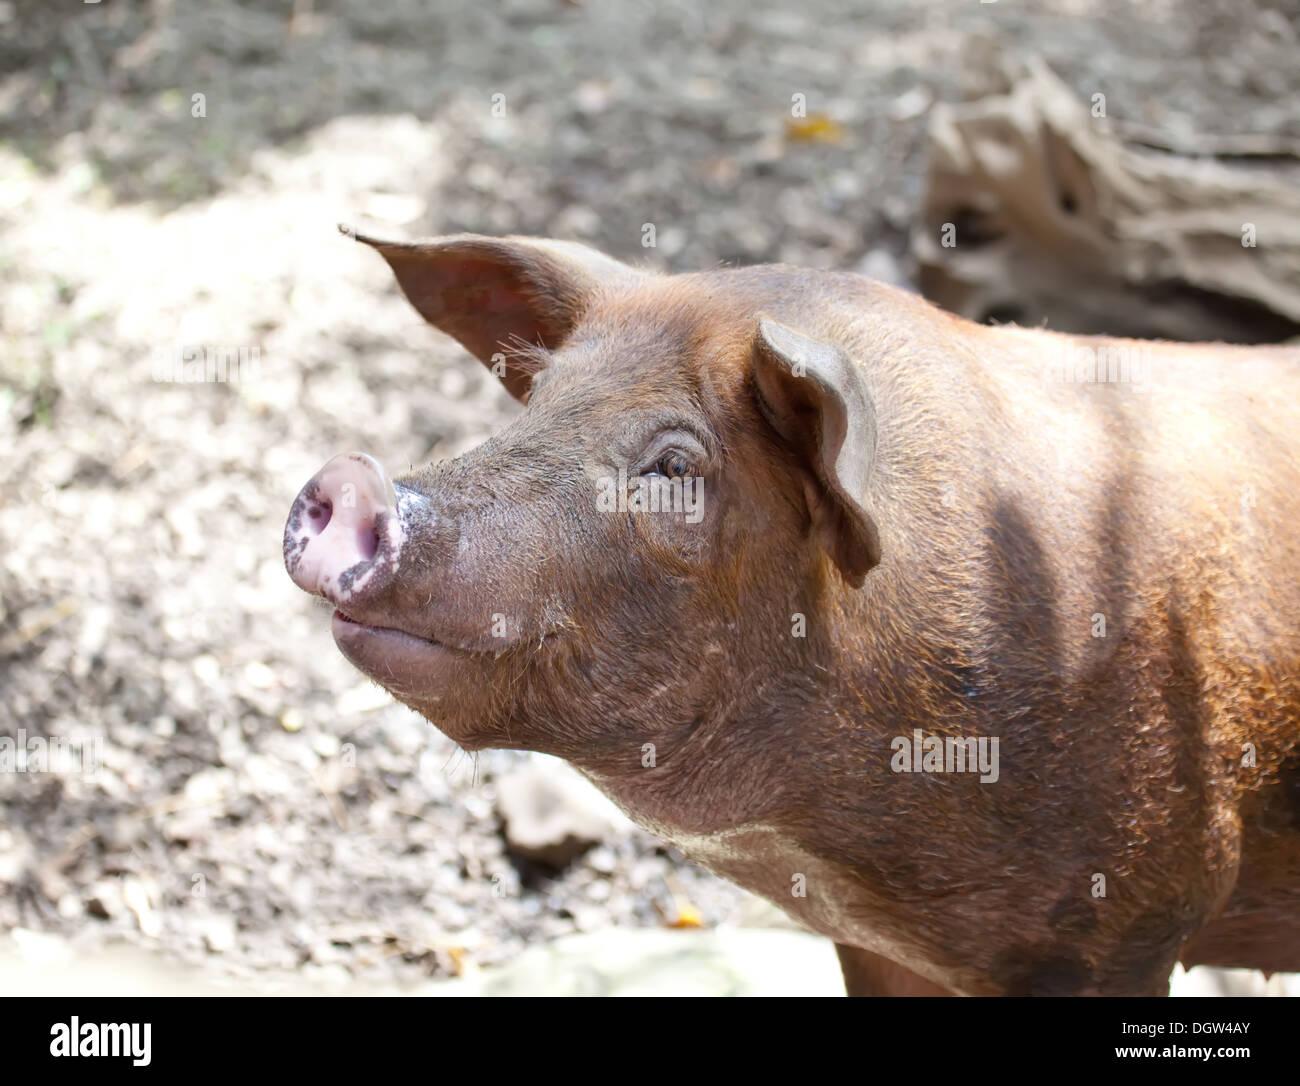 The Big Pig Stock Photo: 62017843